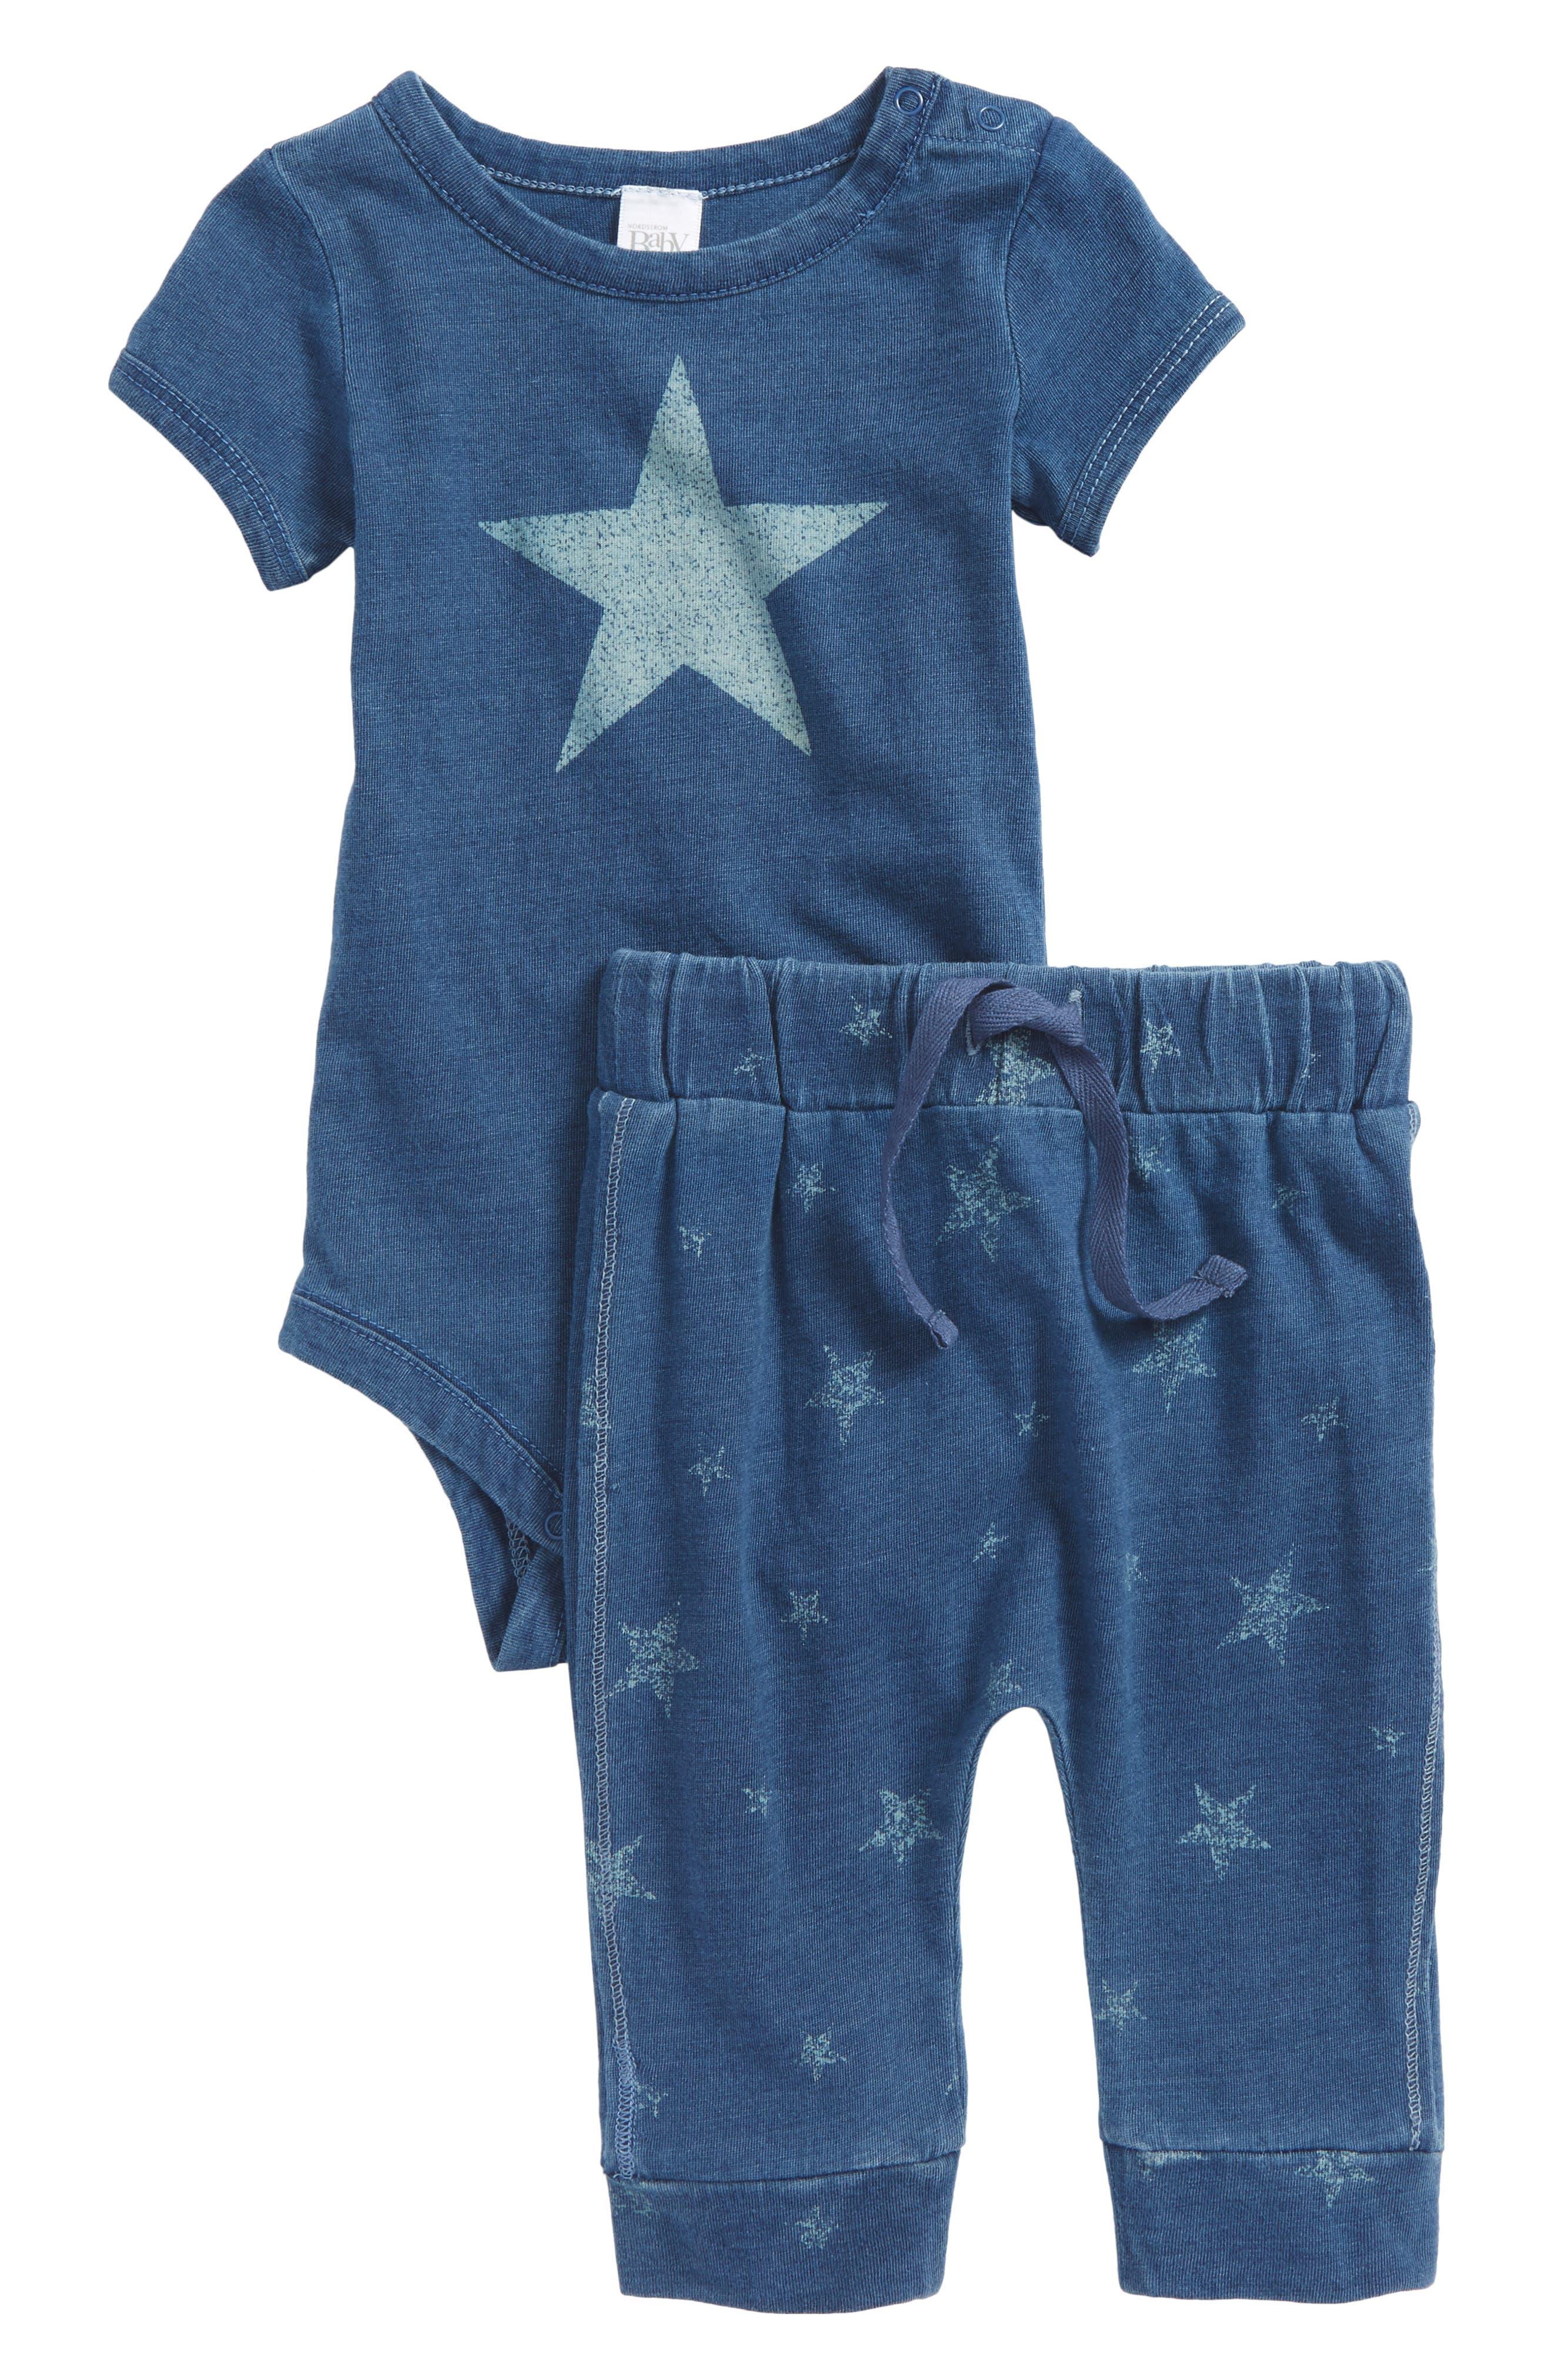 Main Image - Nordstrom Baby Star Bodysuit & Pants Set (Baby)